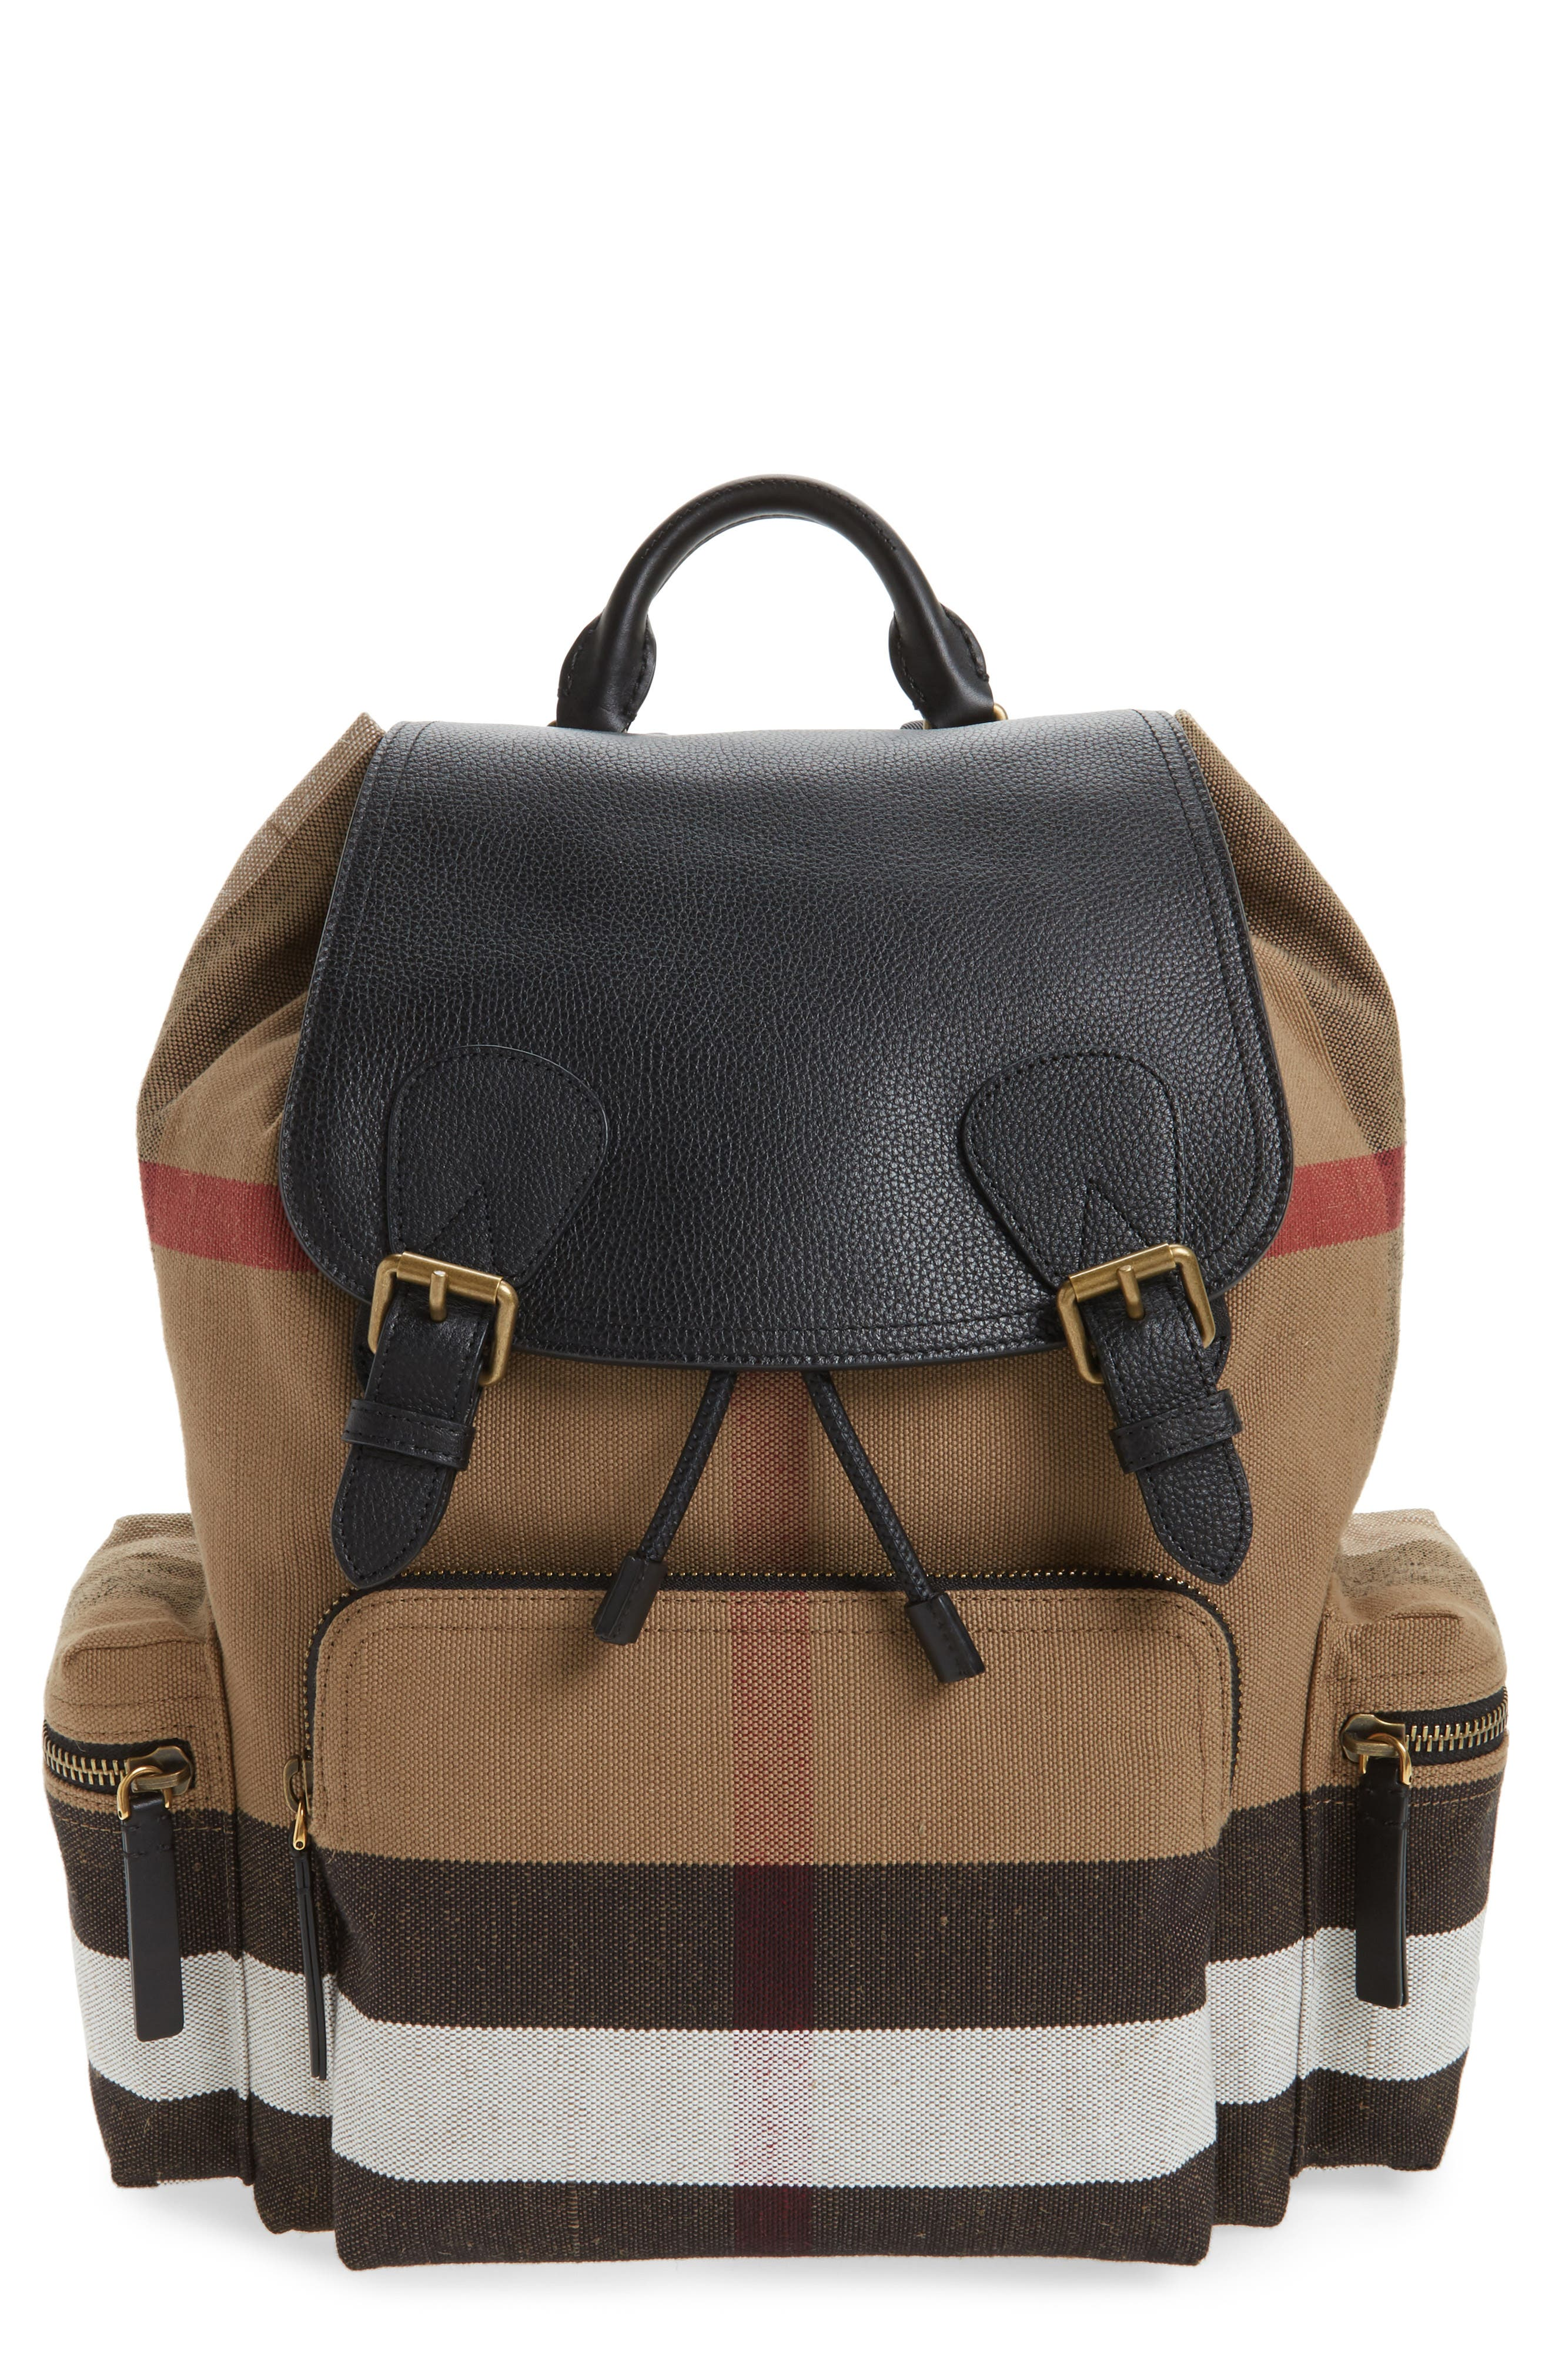 Alternate Image 1 Selected - Burberry Rucksack Backpack